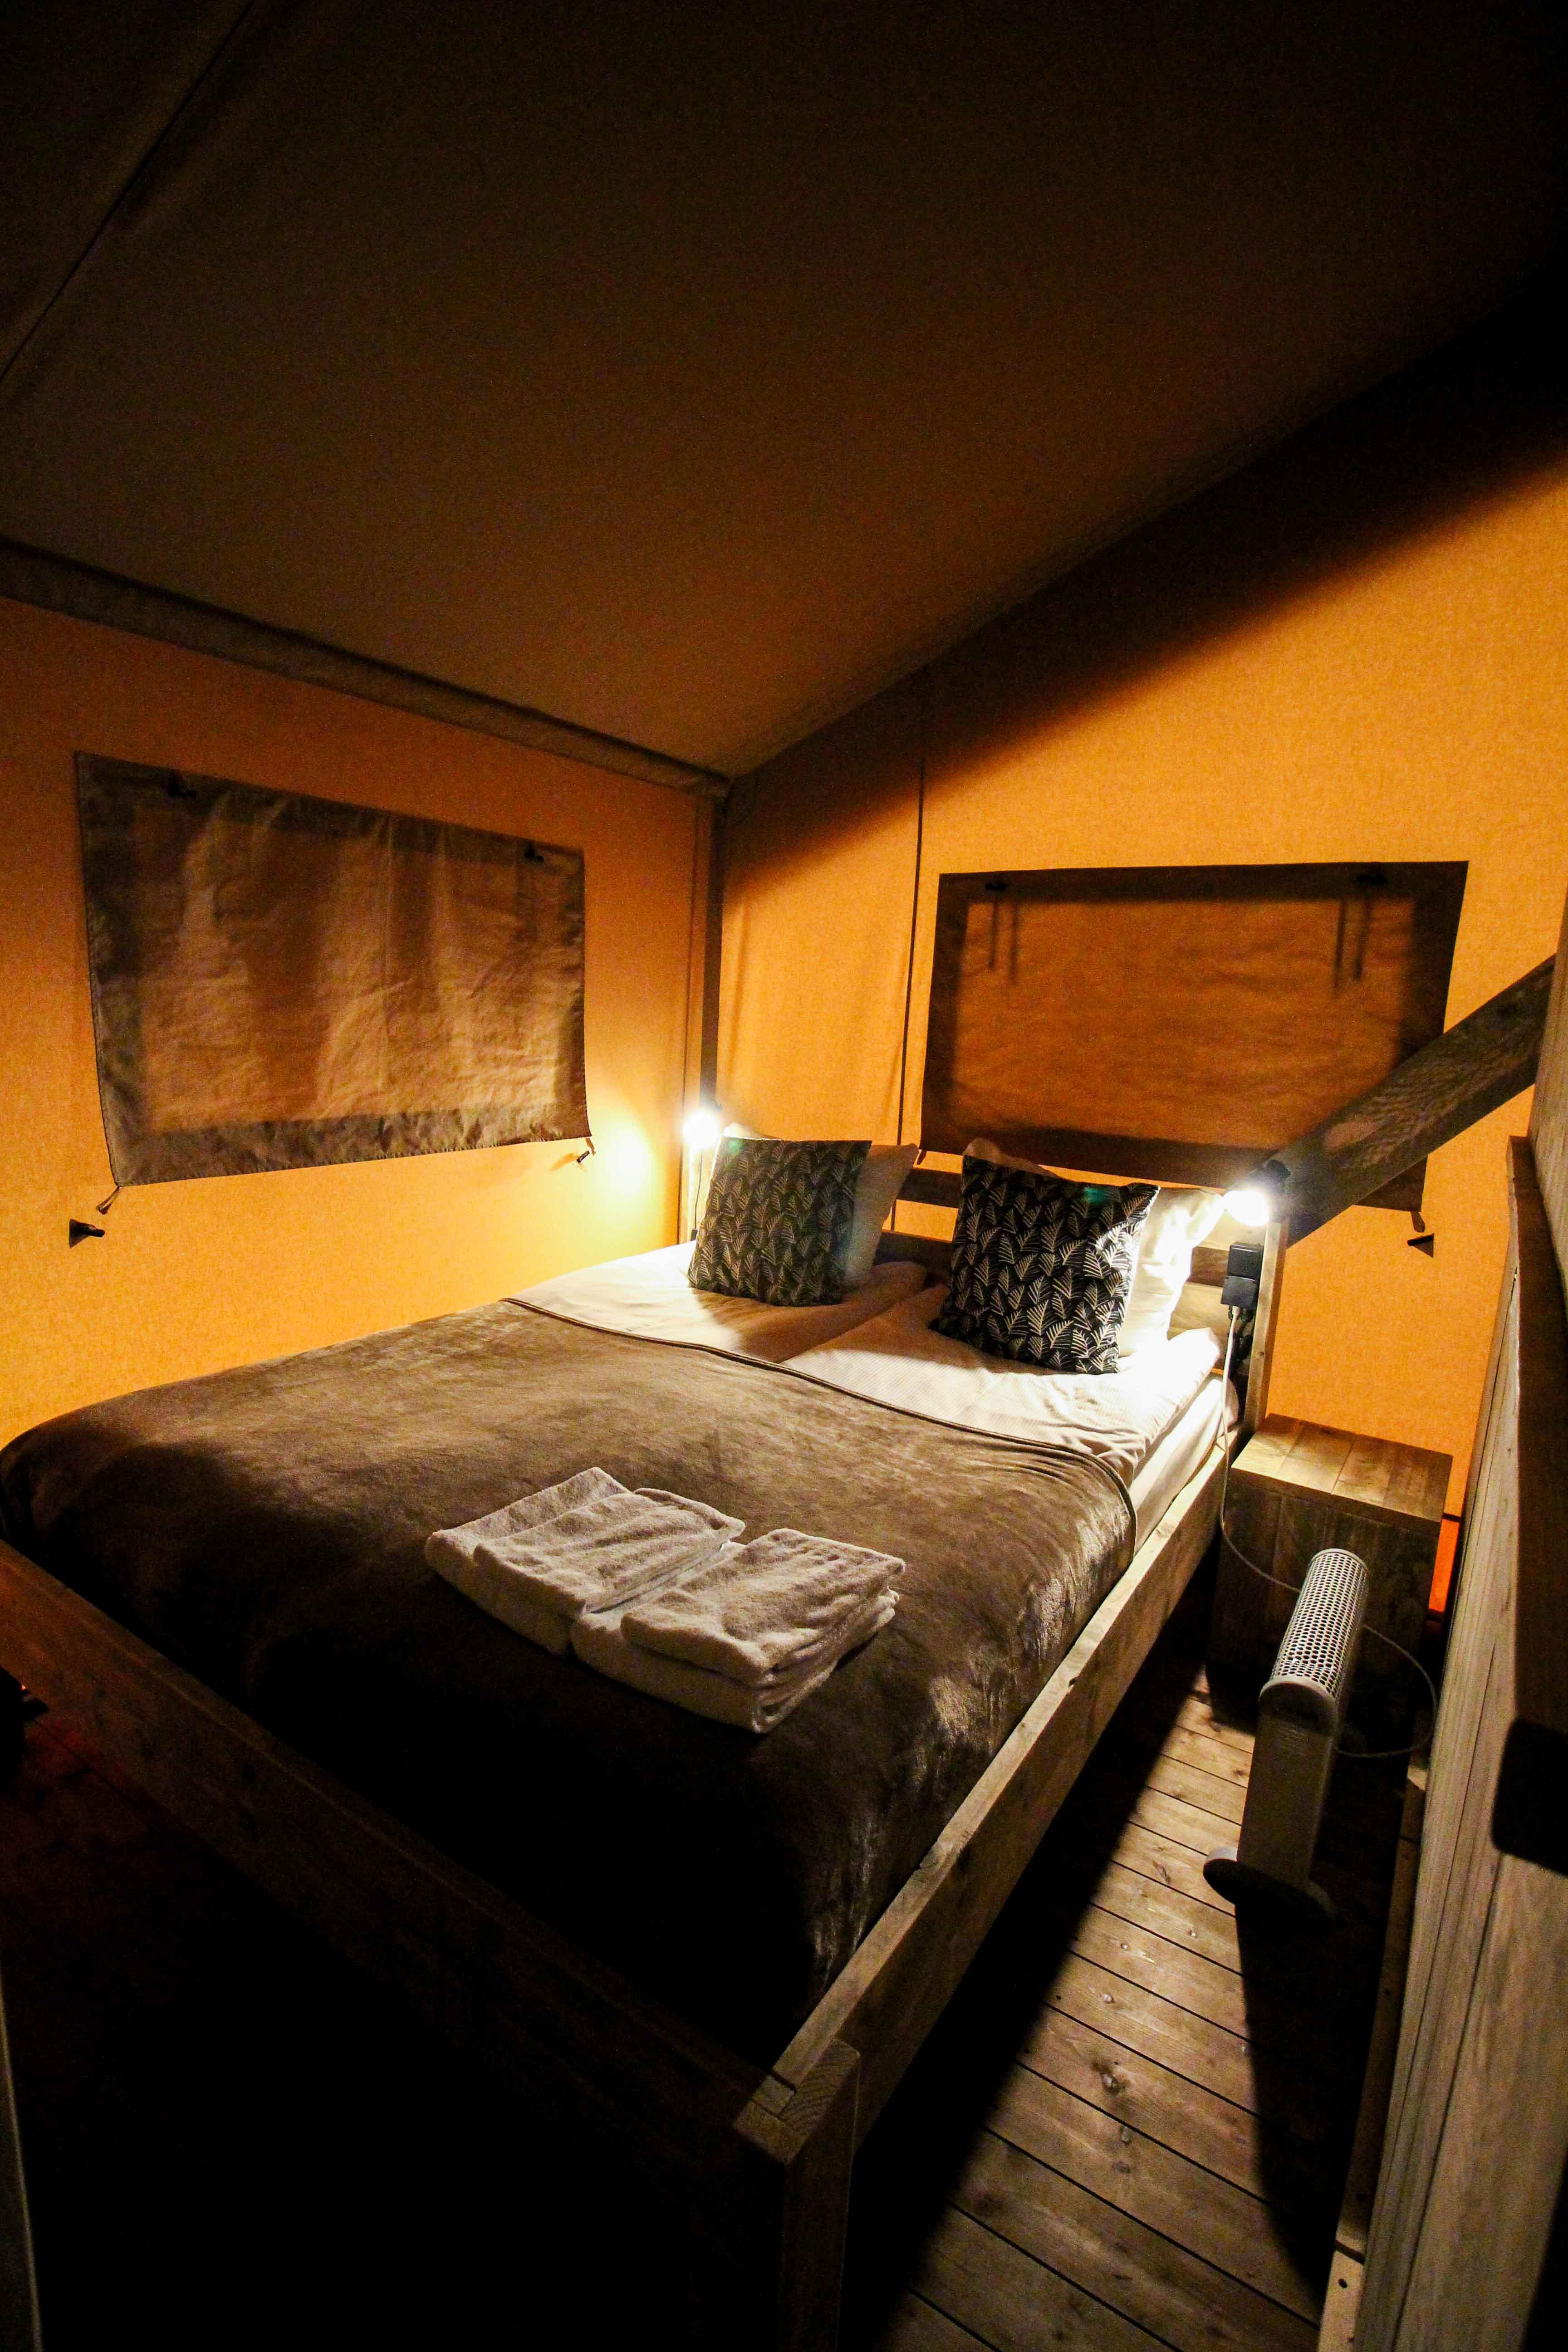 Glamping in Holland Luxuscamping Buitenplaats Beekhuizen Arnheim das andere Holland Reiseblog Zelt Lodgetent Schlafzimmer